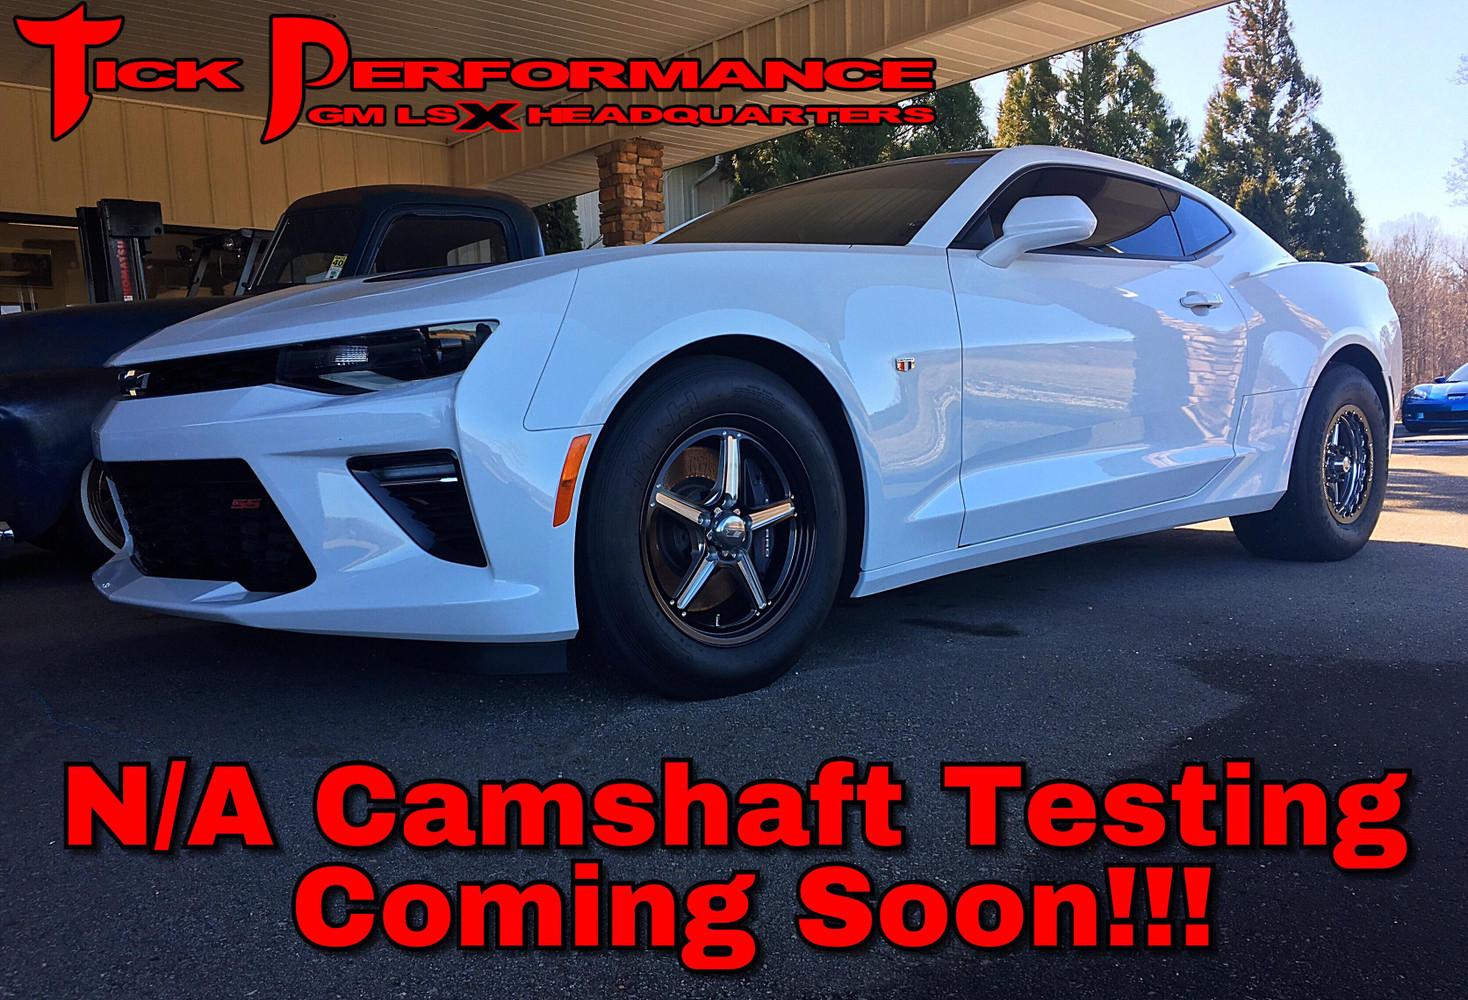 NA Camshaft Testing Coming Soon for New Gen LTX Camaros!!!!